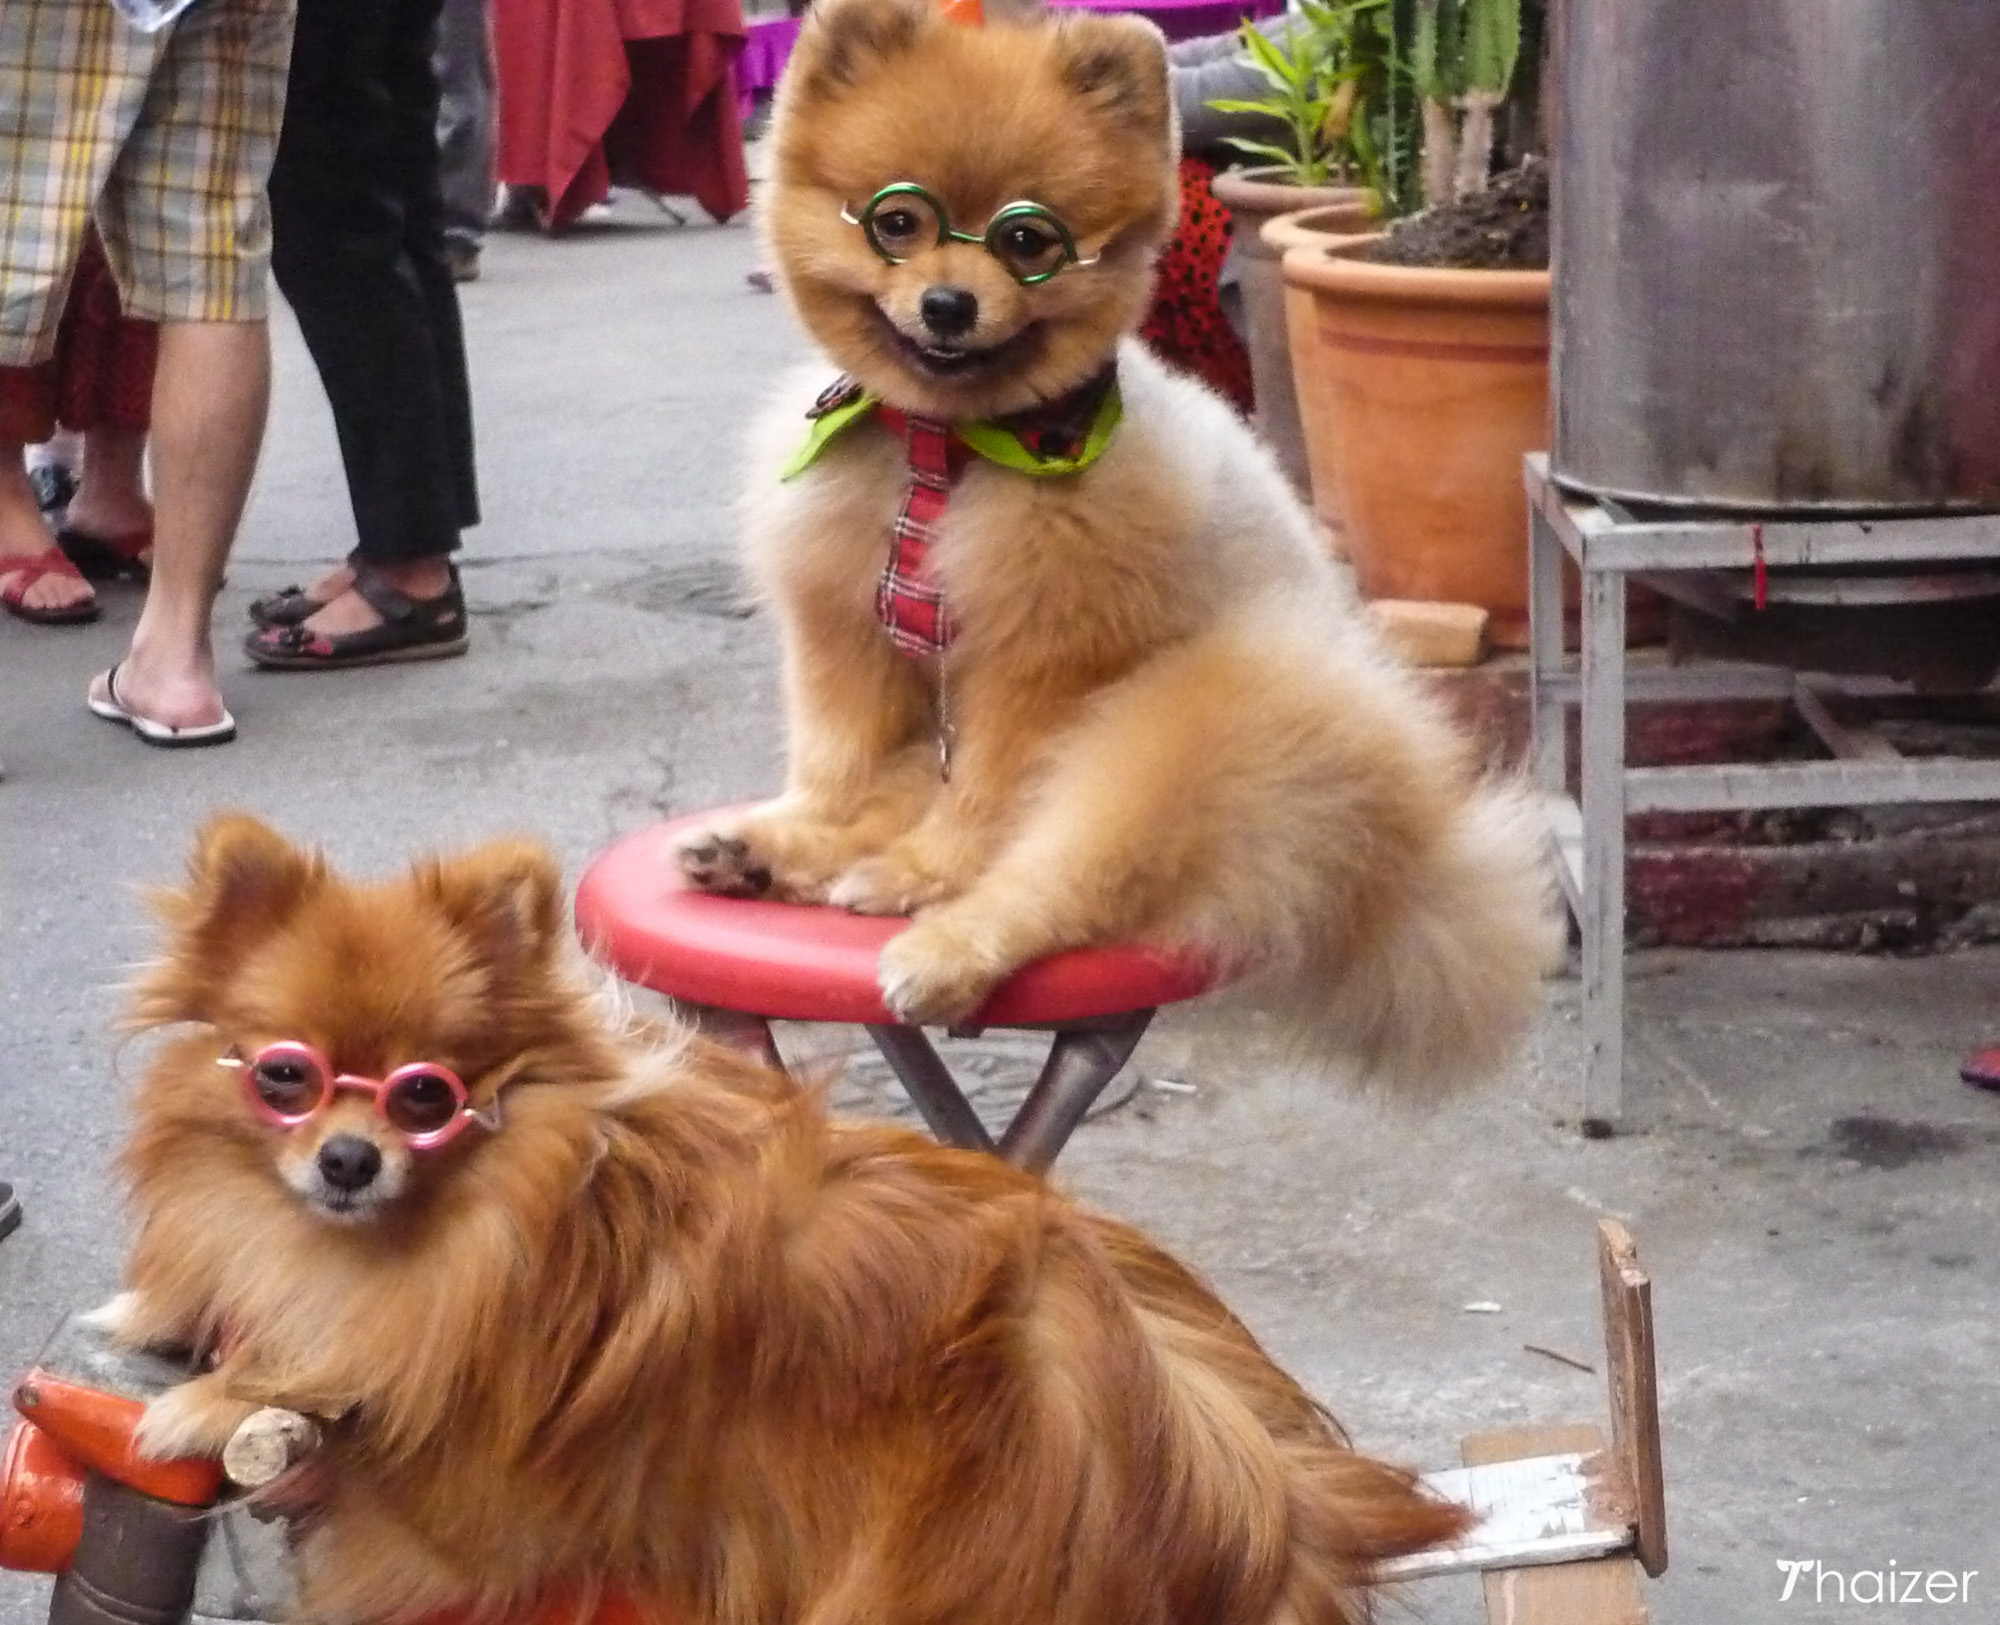 dogs in glasses